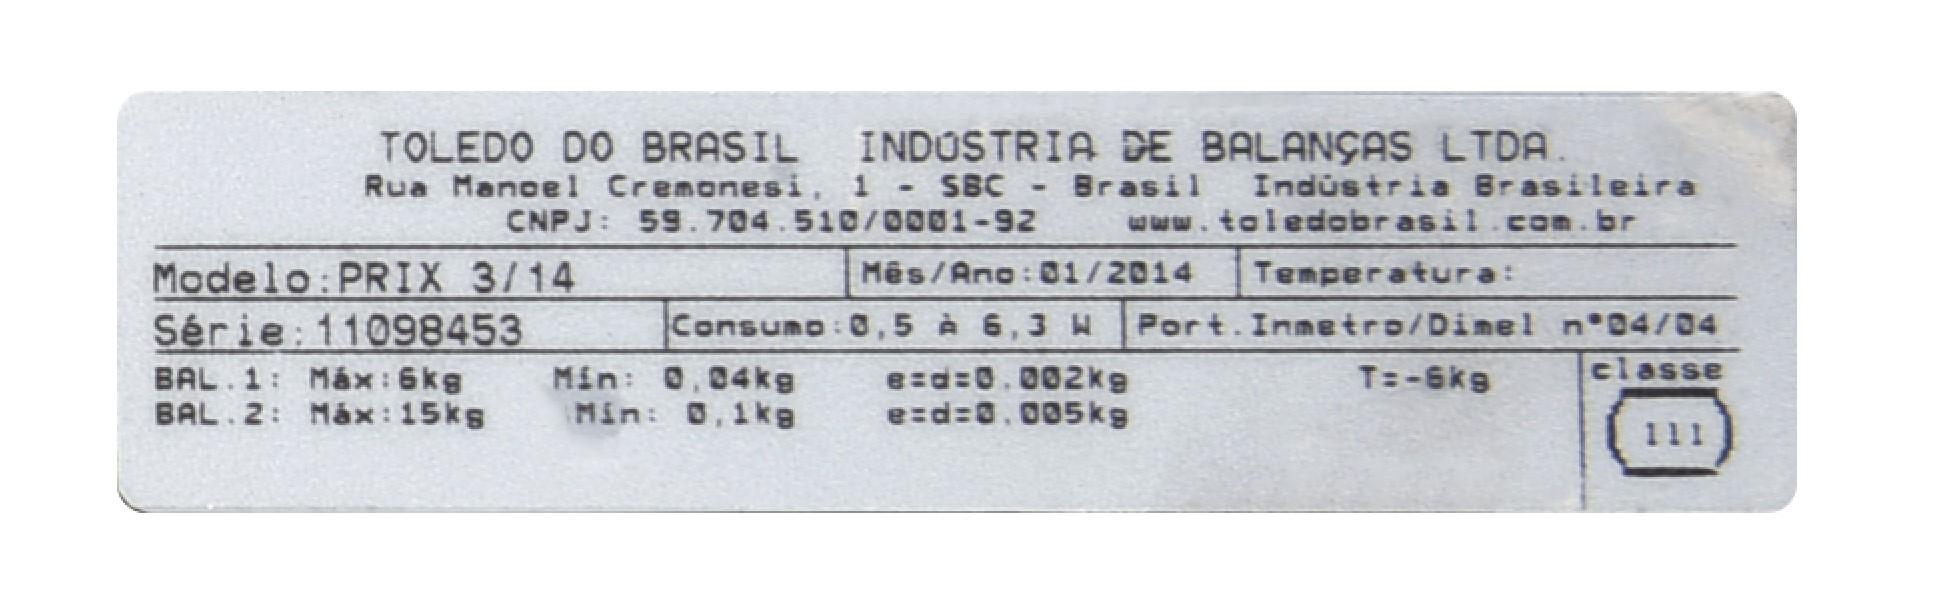 19122016a